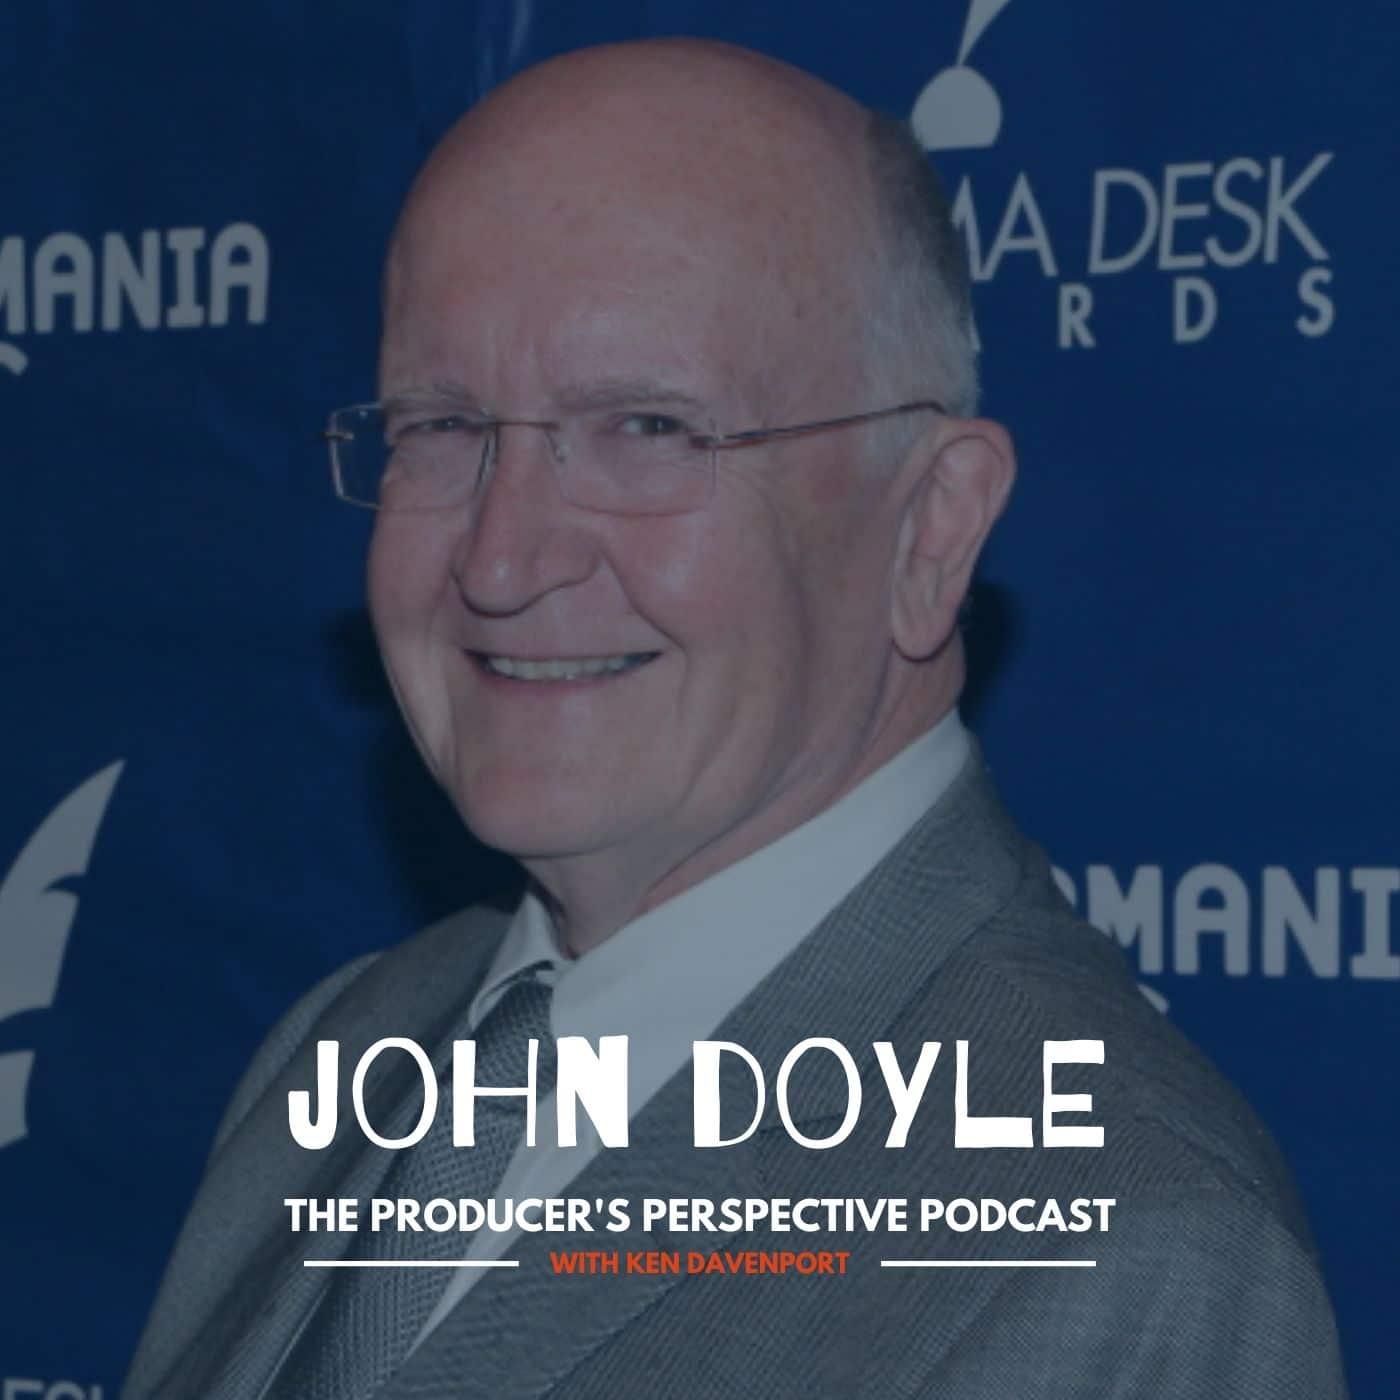 Ken Davenport's The Producer's Perspective Podcast Episode 71 - John Doyle